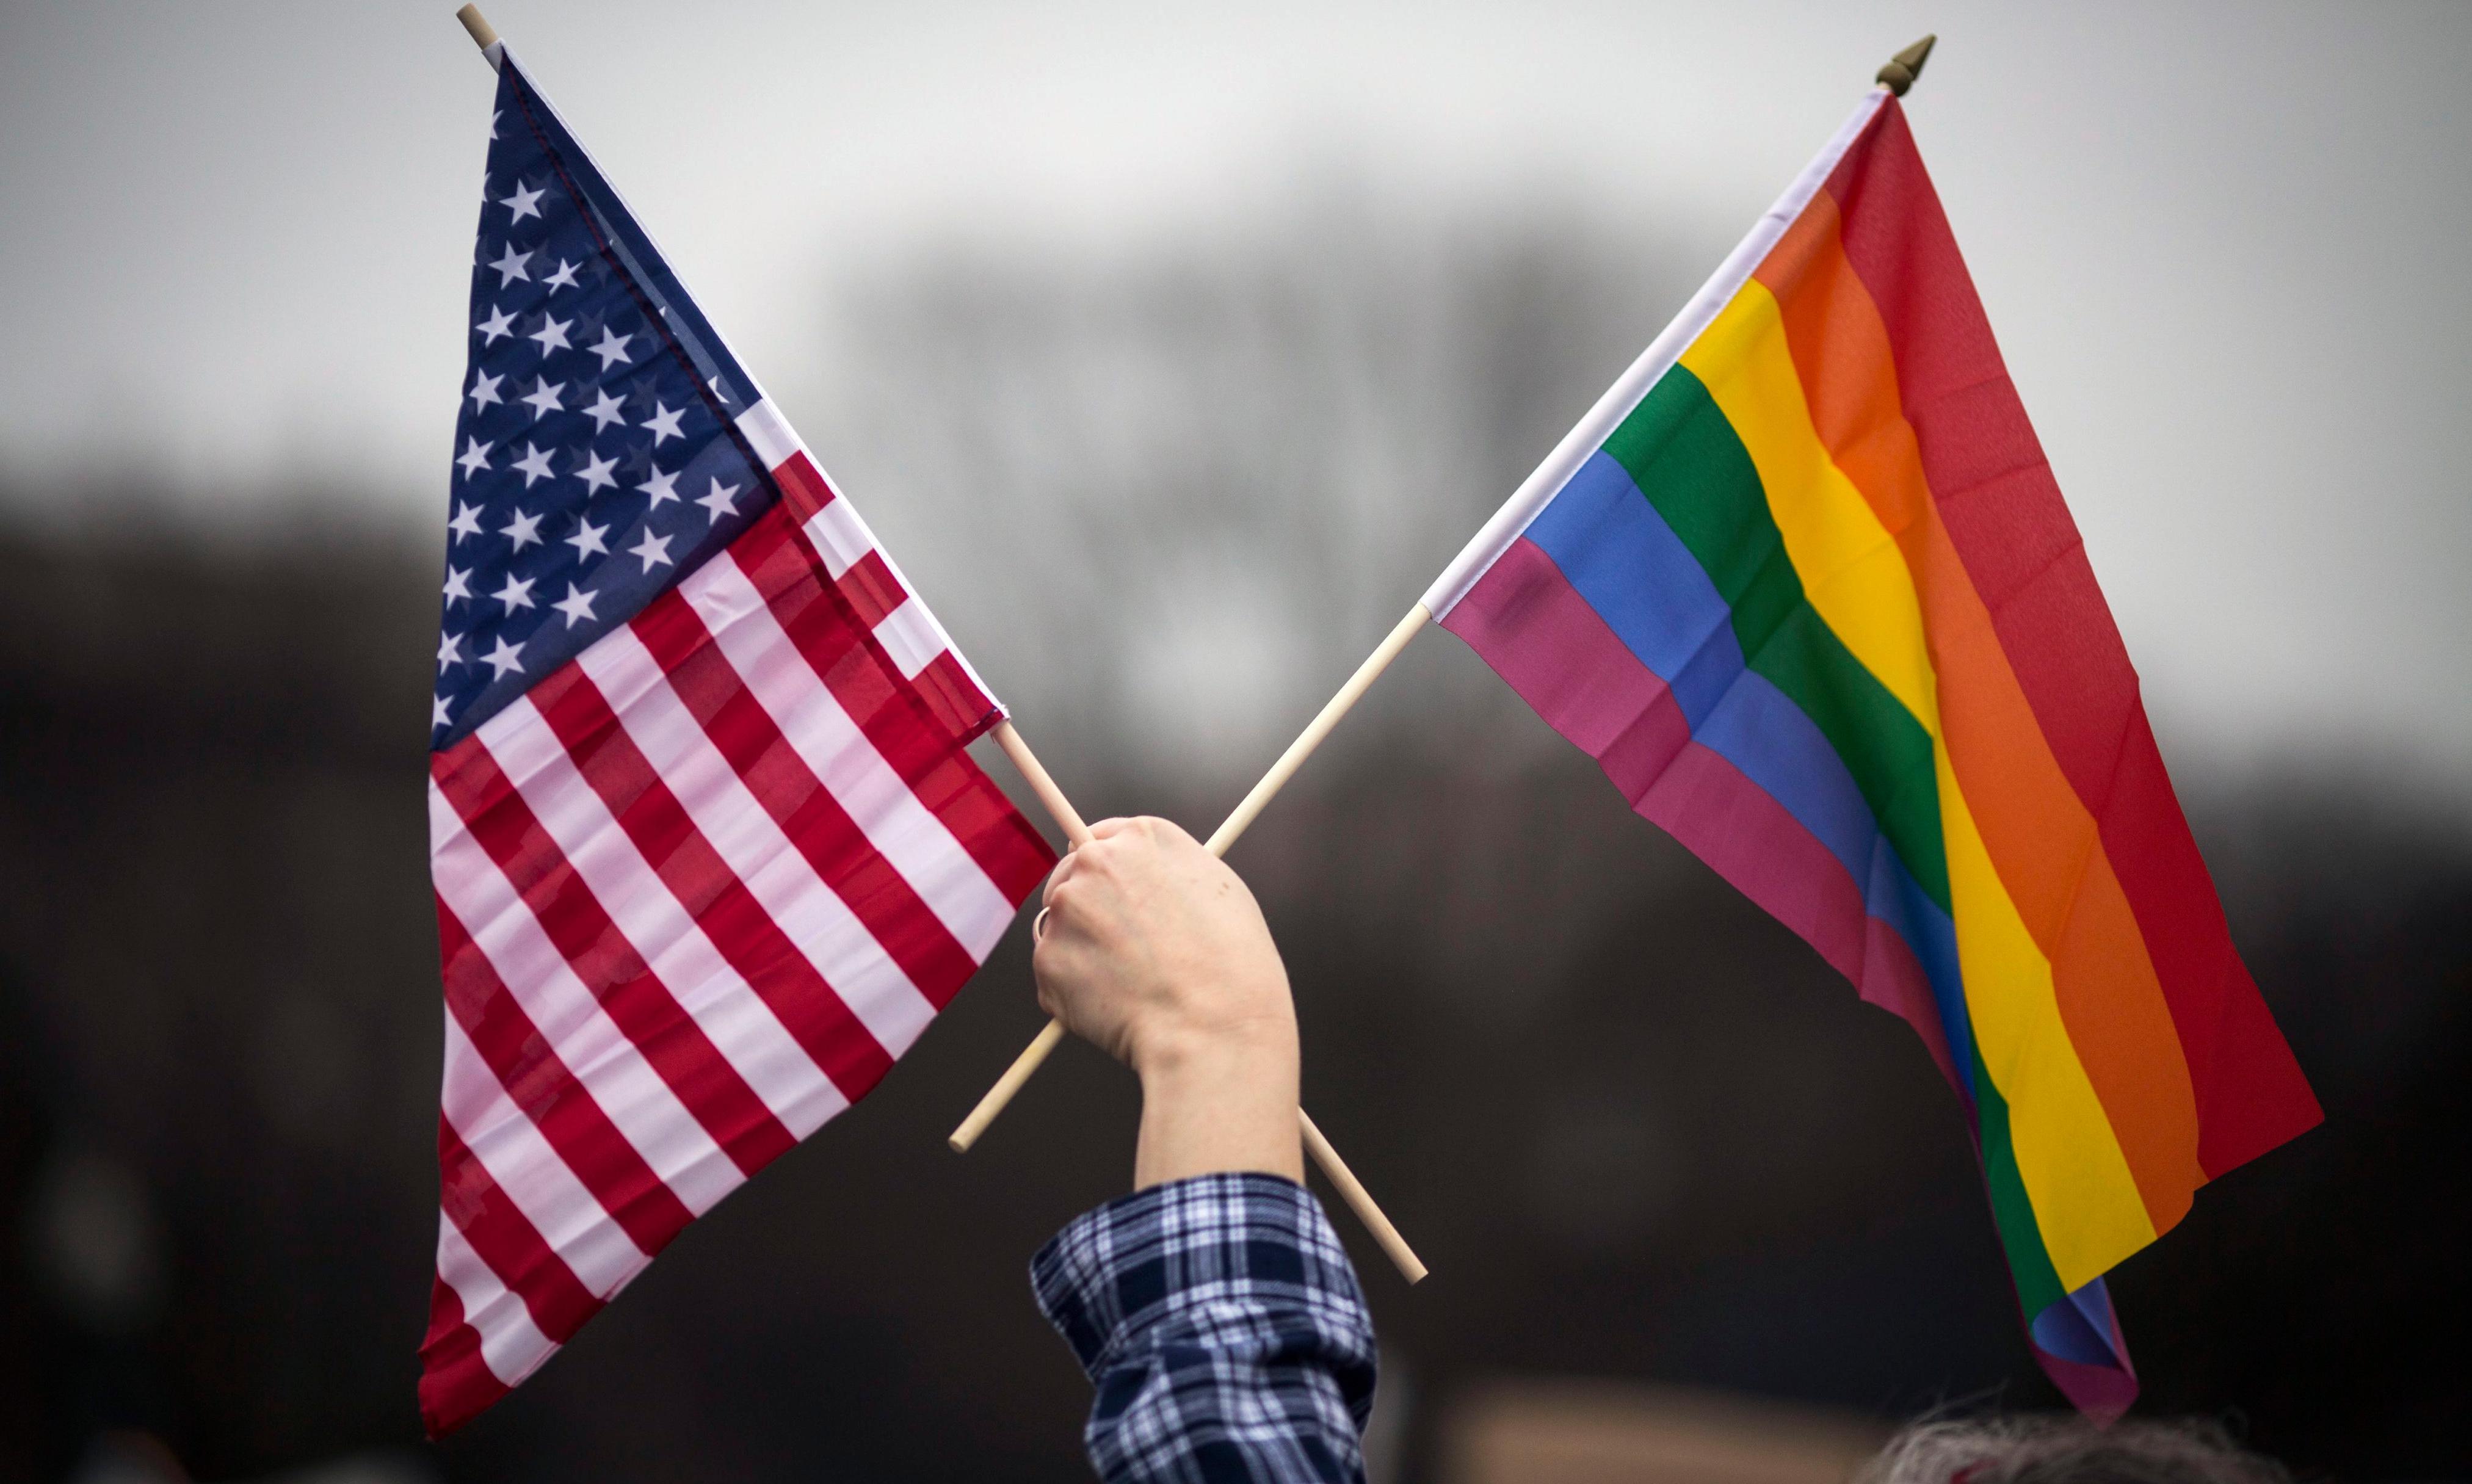 US begins denying visas for same-sex domestic partners of diplomats